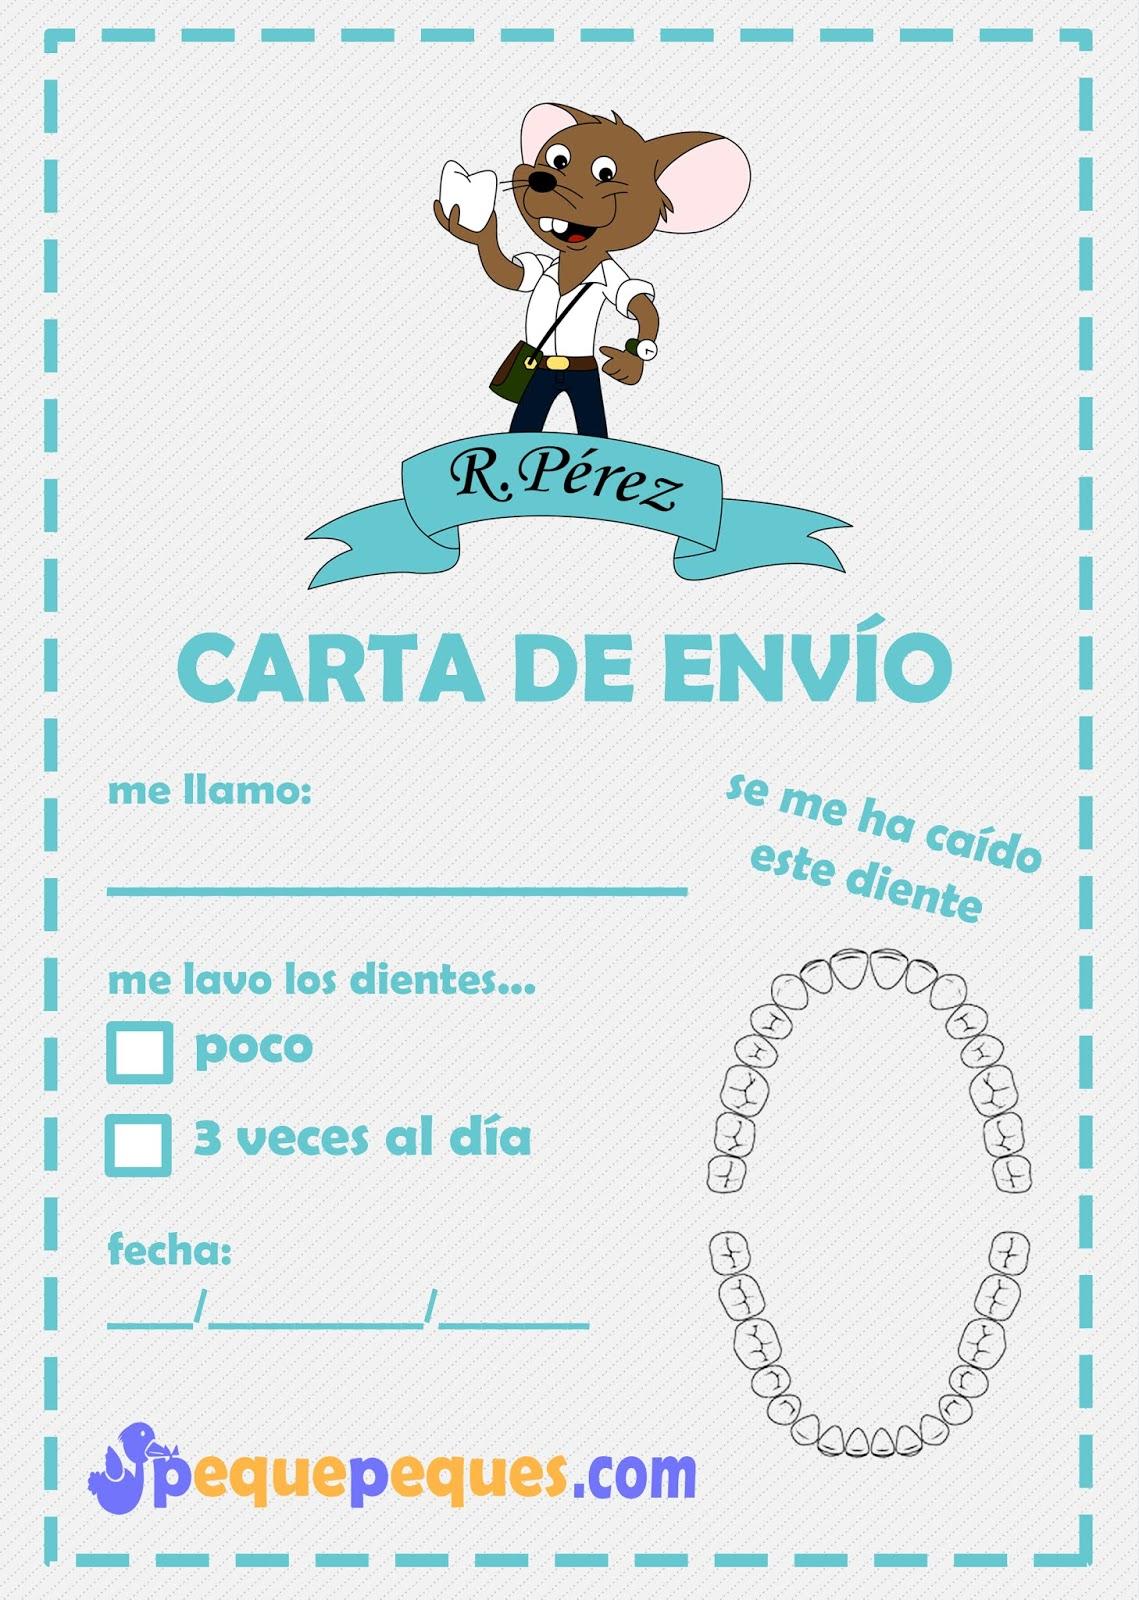 Carta de envío al ratoncito Pérez - IMPRIMIBLE